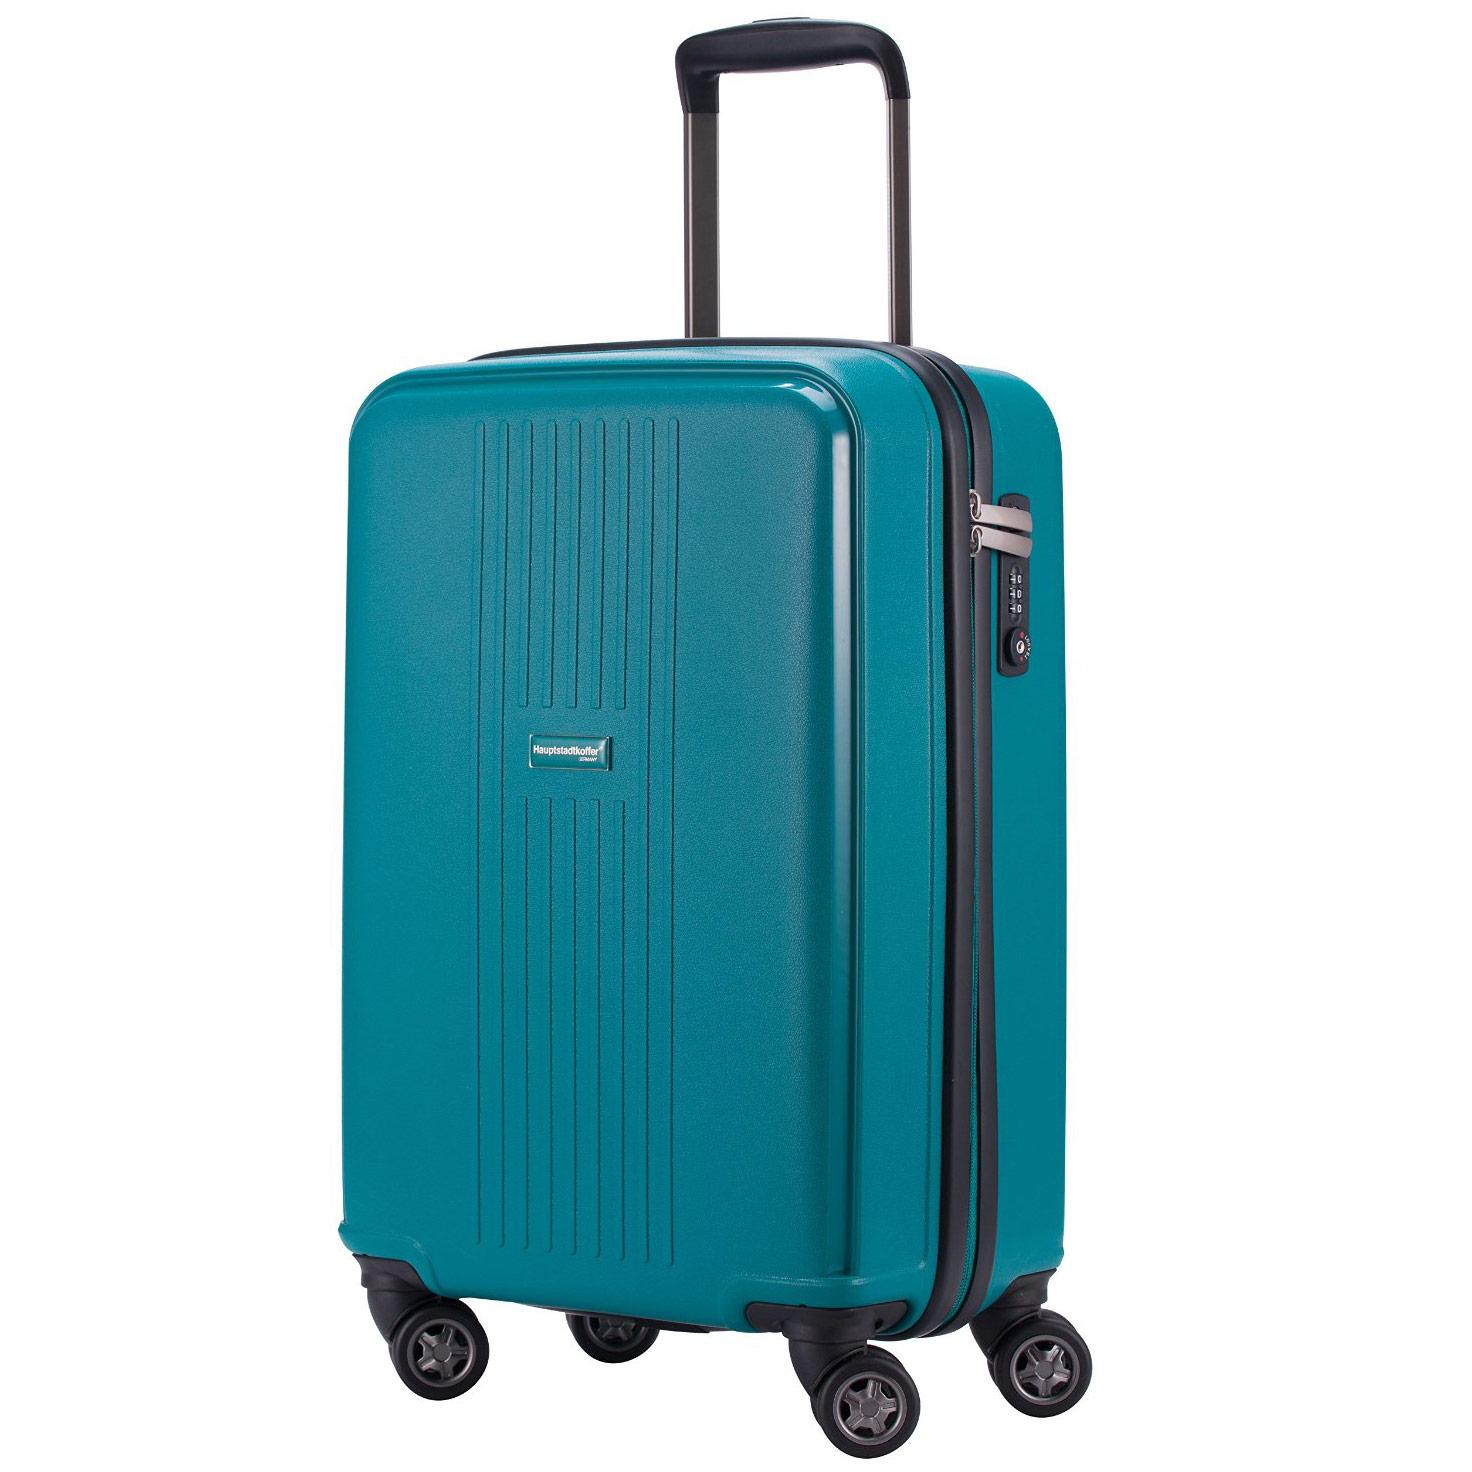 Leichtes Bordgepäck Koffer 55x36x21 cm - blau